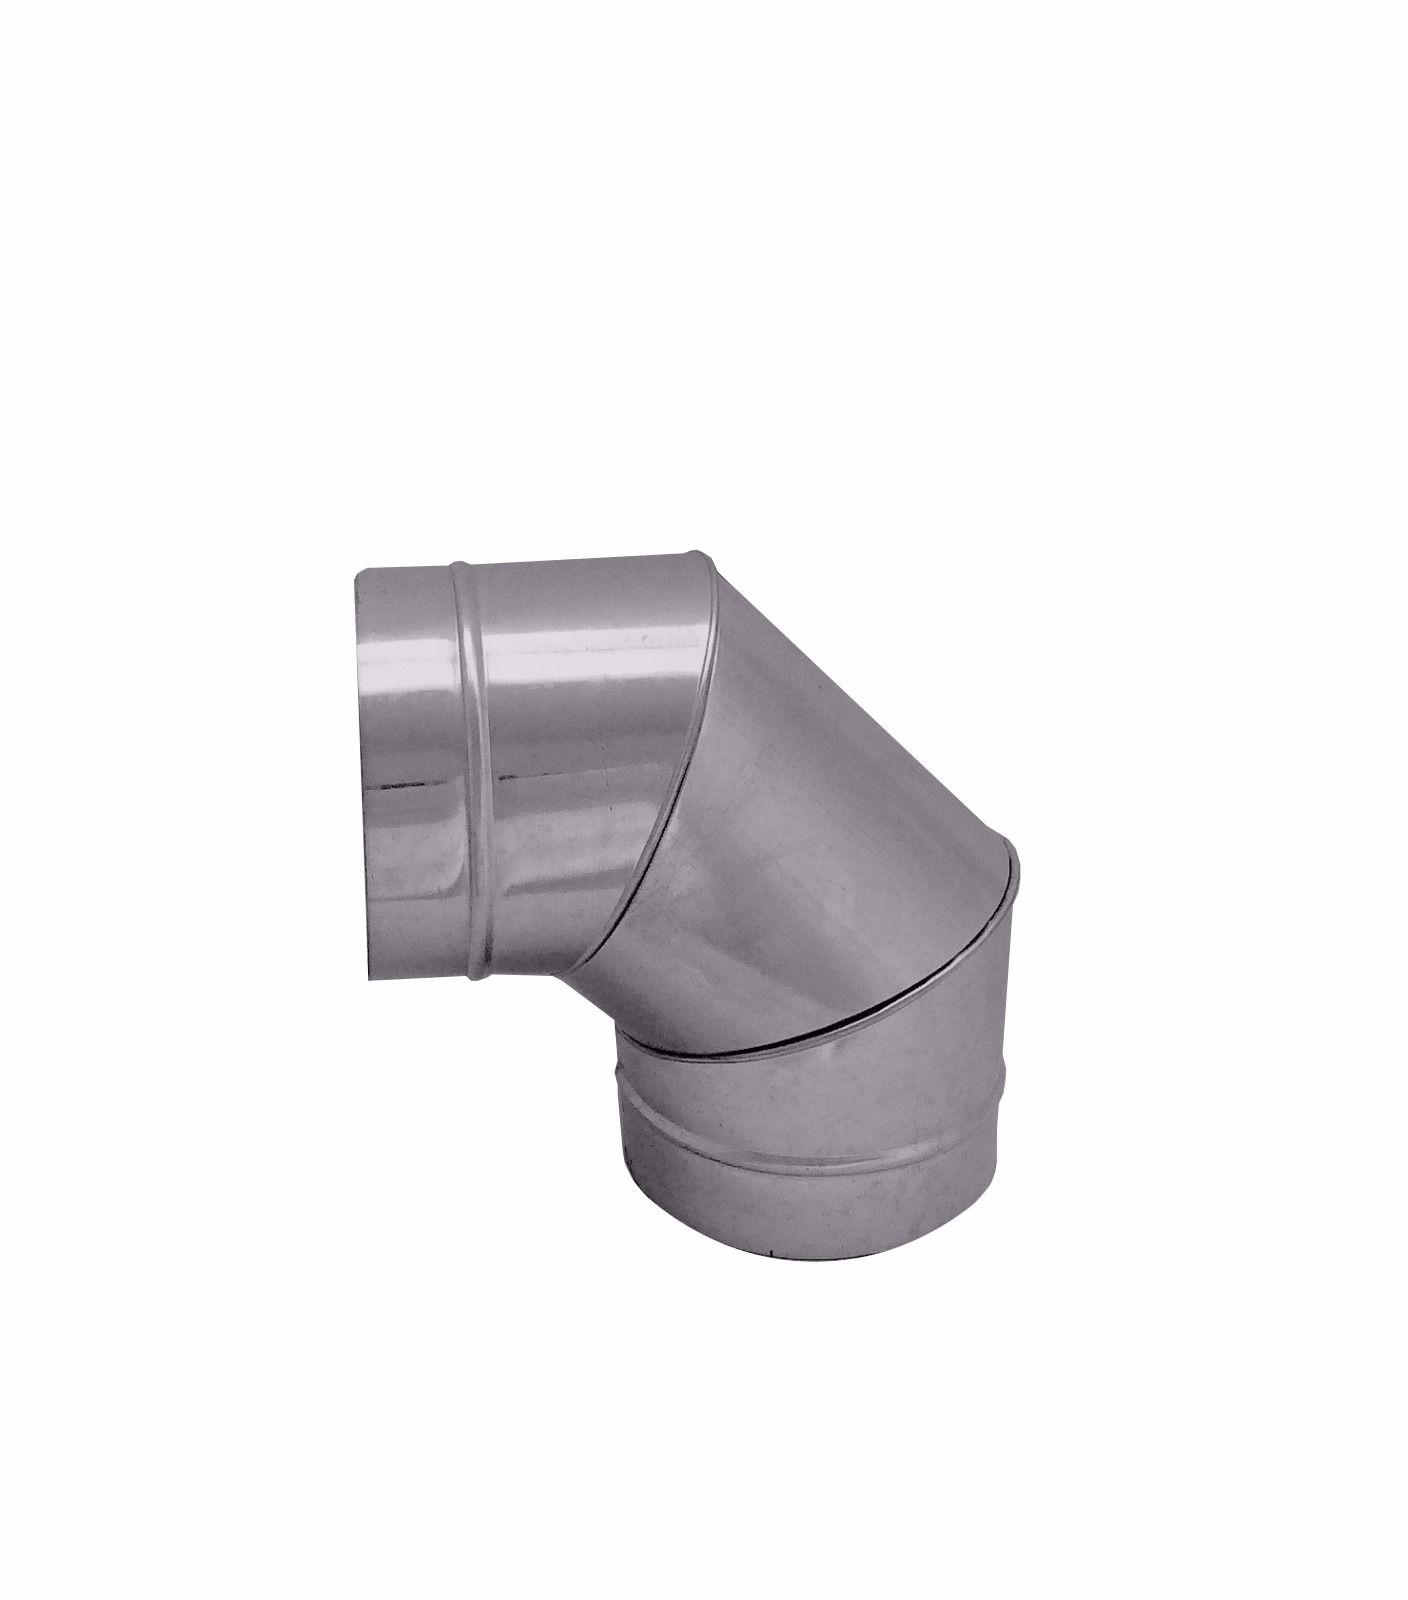 Curva / cotovelo galvanizada 90° de 260 mm de diâmetro  - Galvocalhas